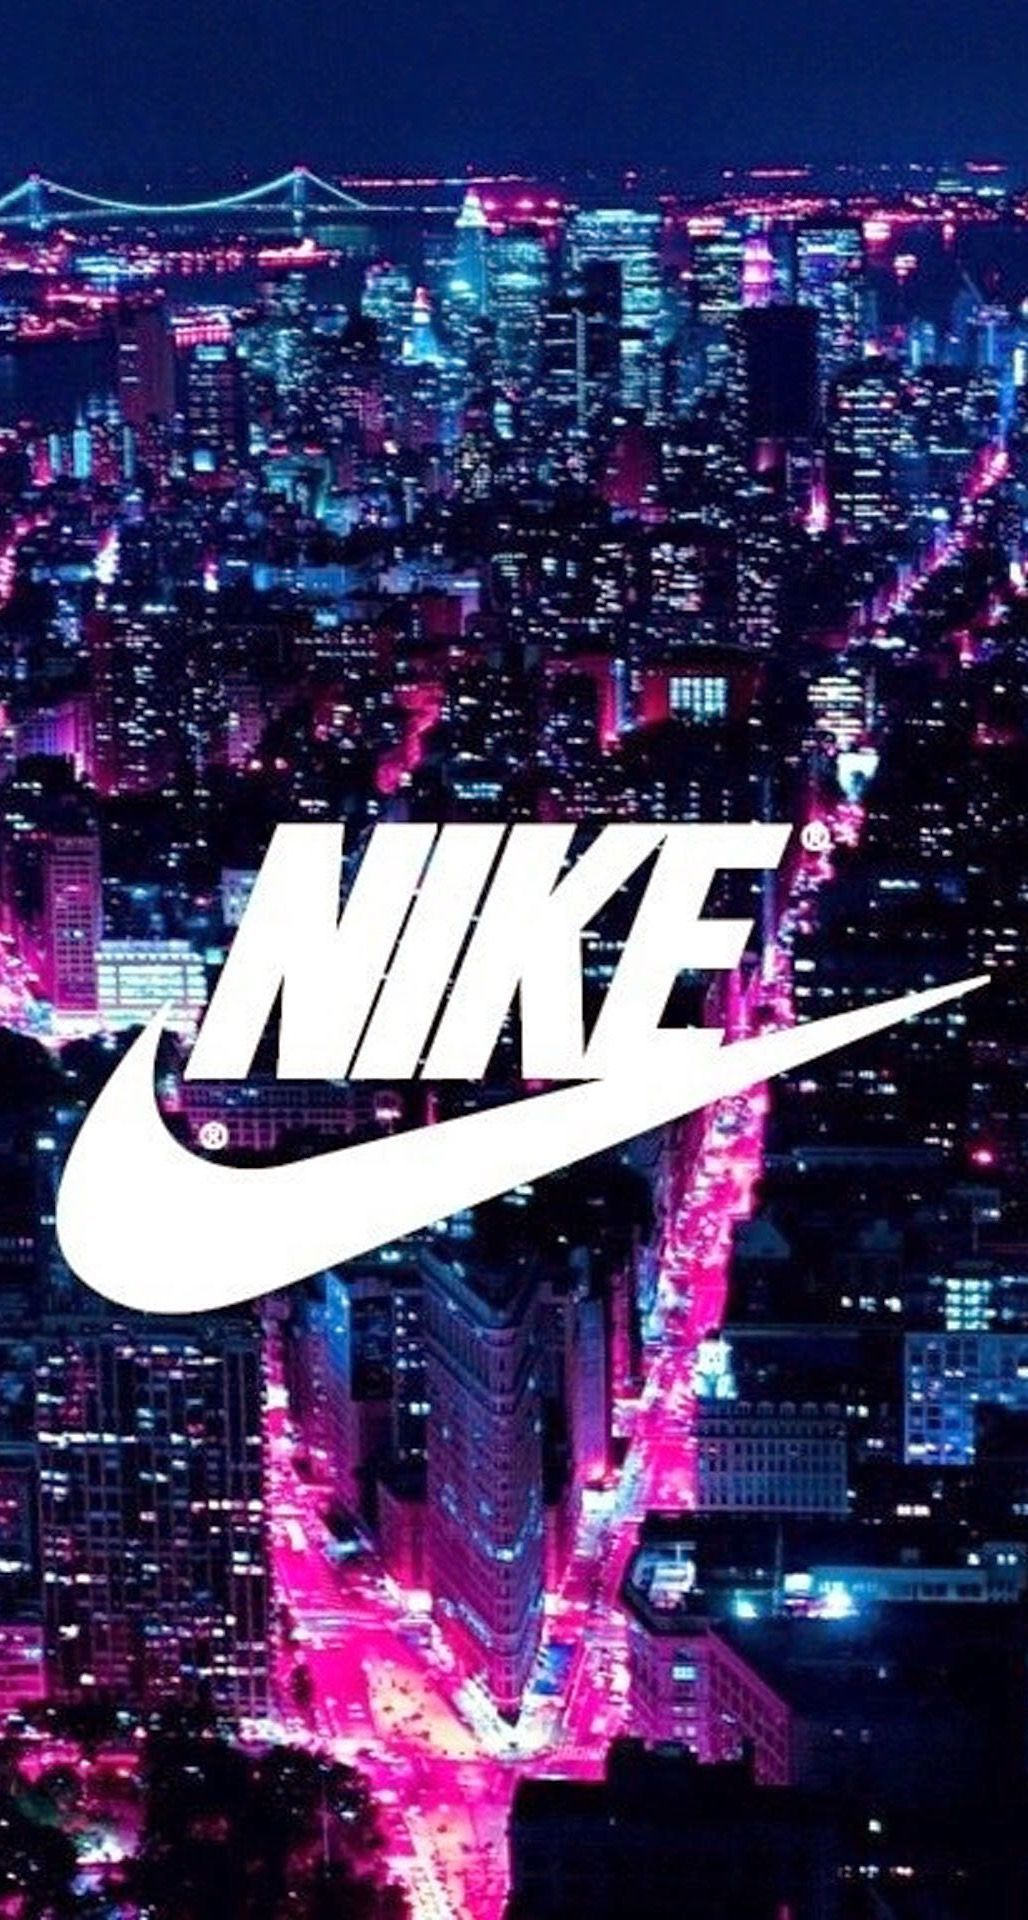 Audi Hd Audi Hd In 2020 Nike Wallpaper Nike Wallpaper Iphone Logo Wallpaper Hd